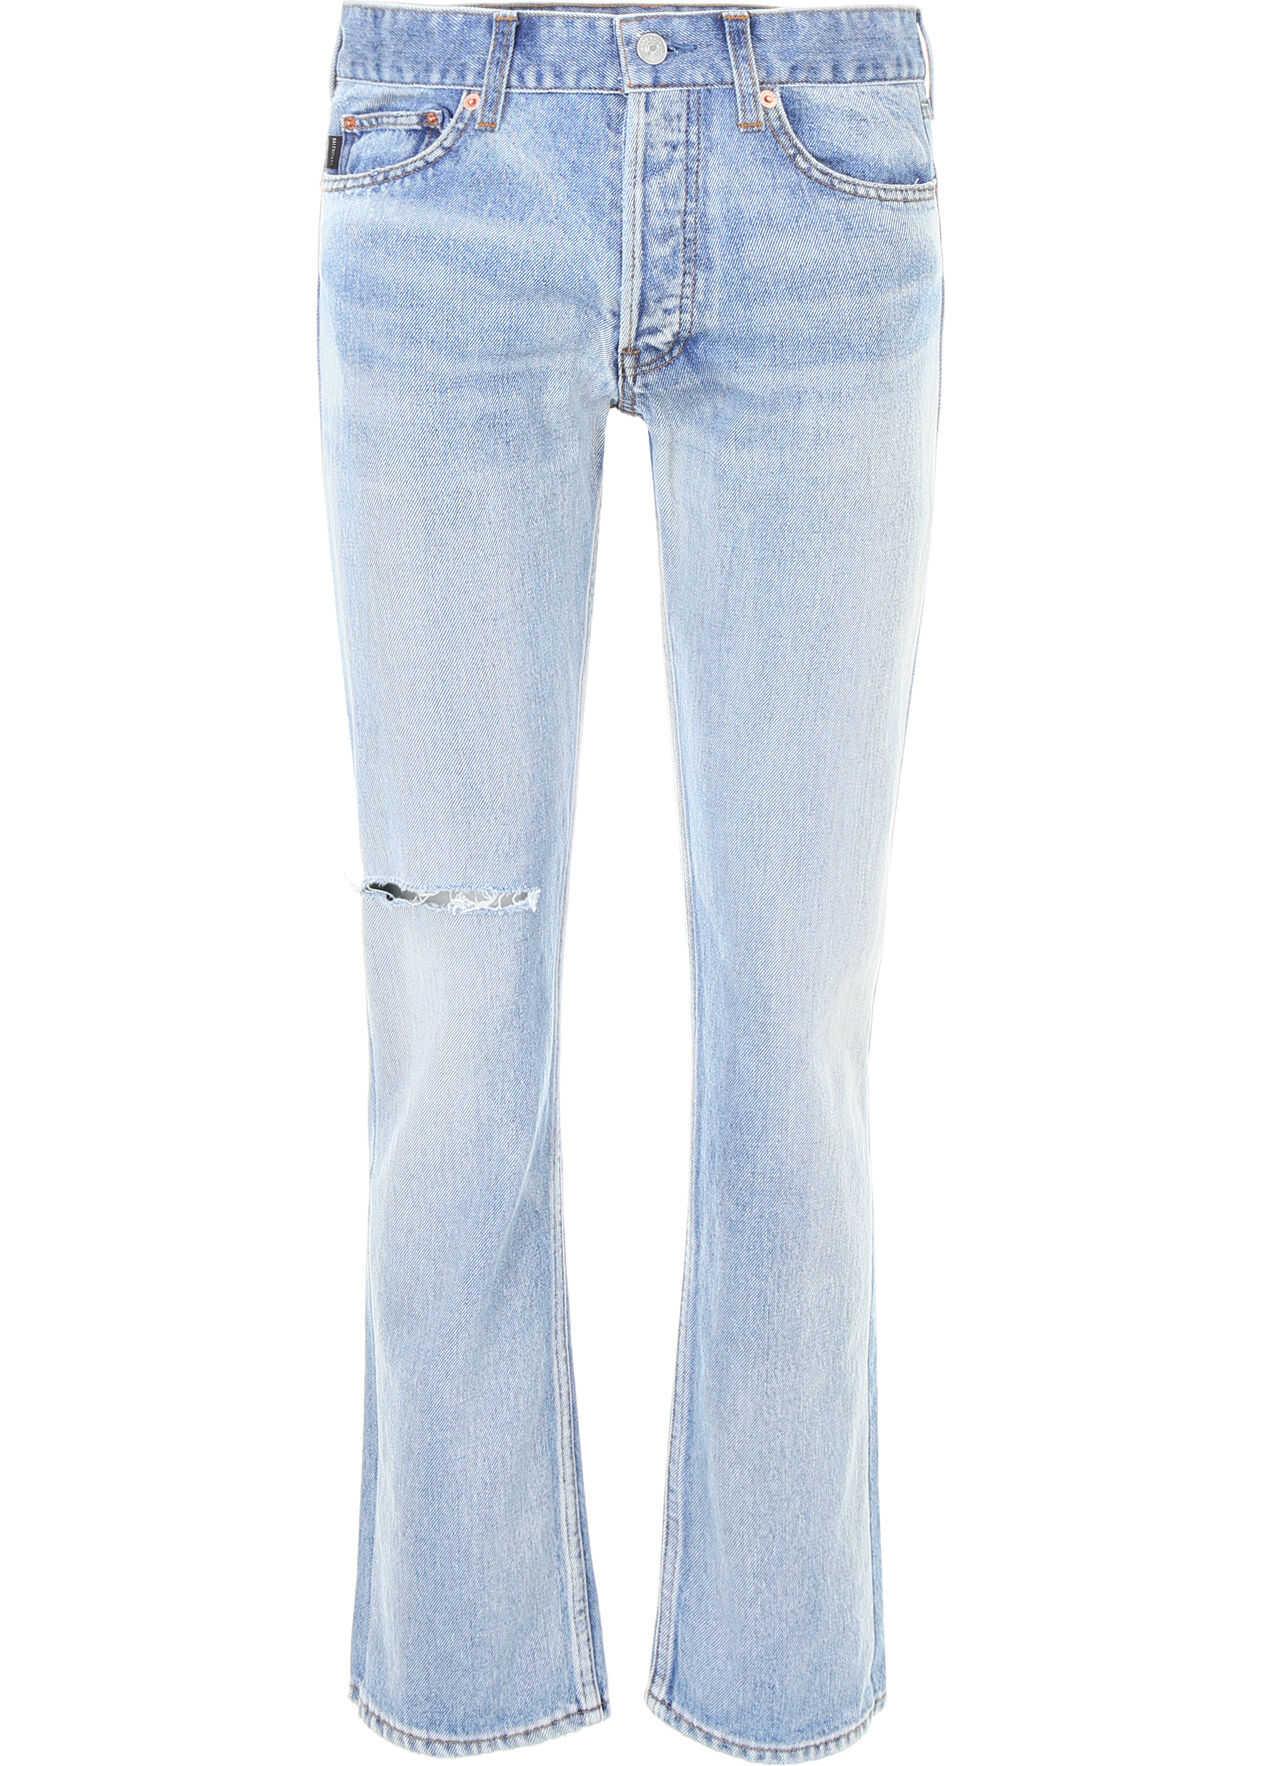 Balenciaga Destroyed Jeans DIRT SMOK L BLU